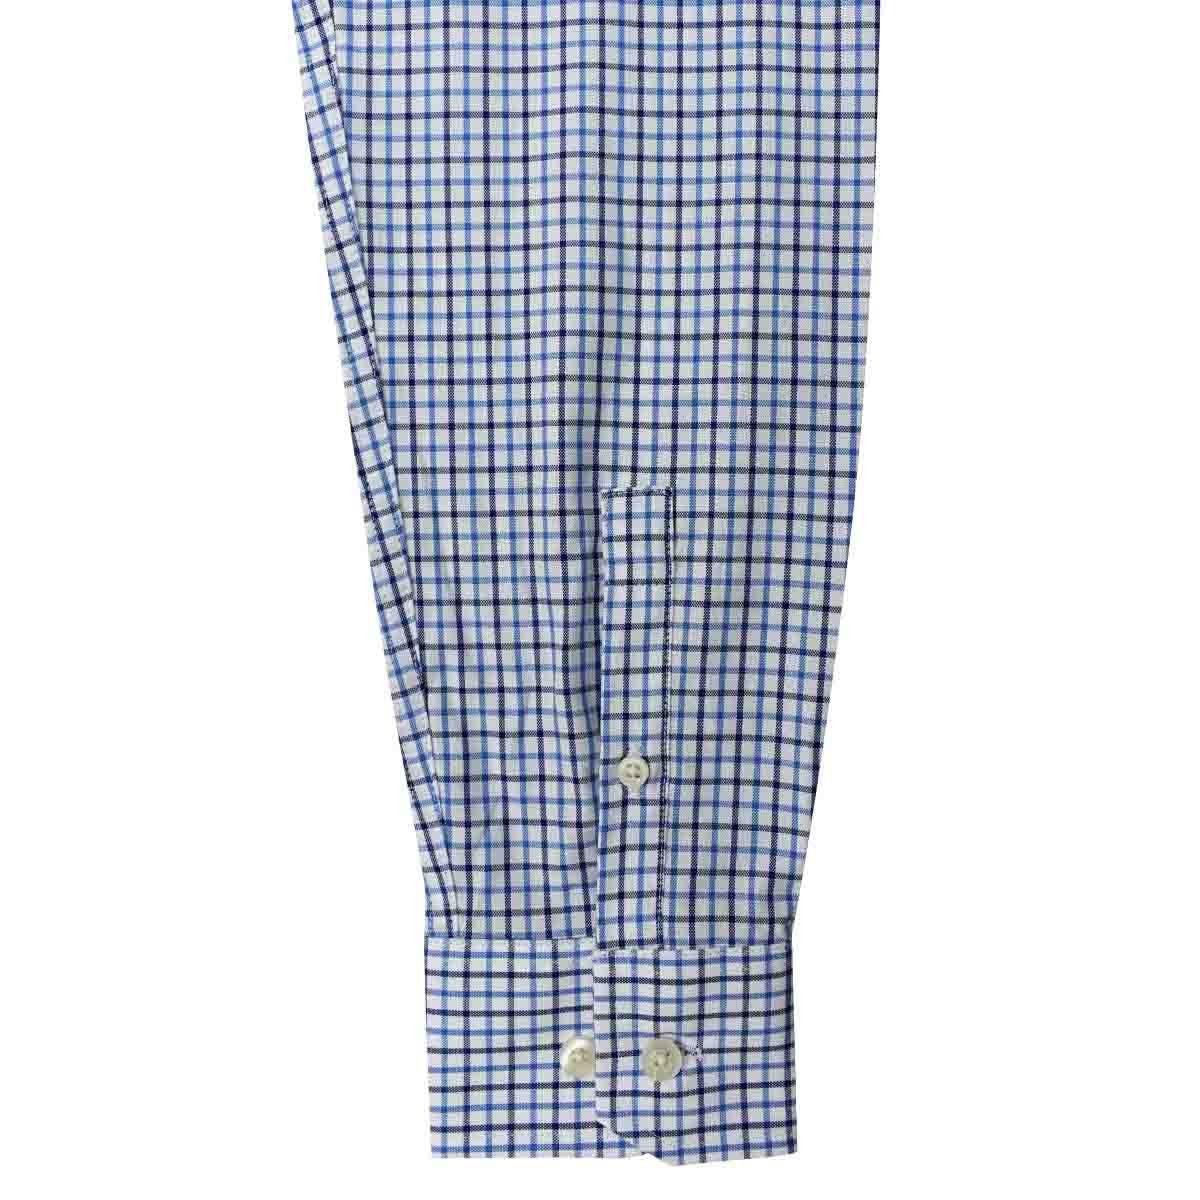 Camisa de Vestir Azul Combinado Corte Regular Nautica